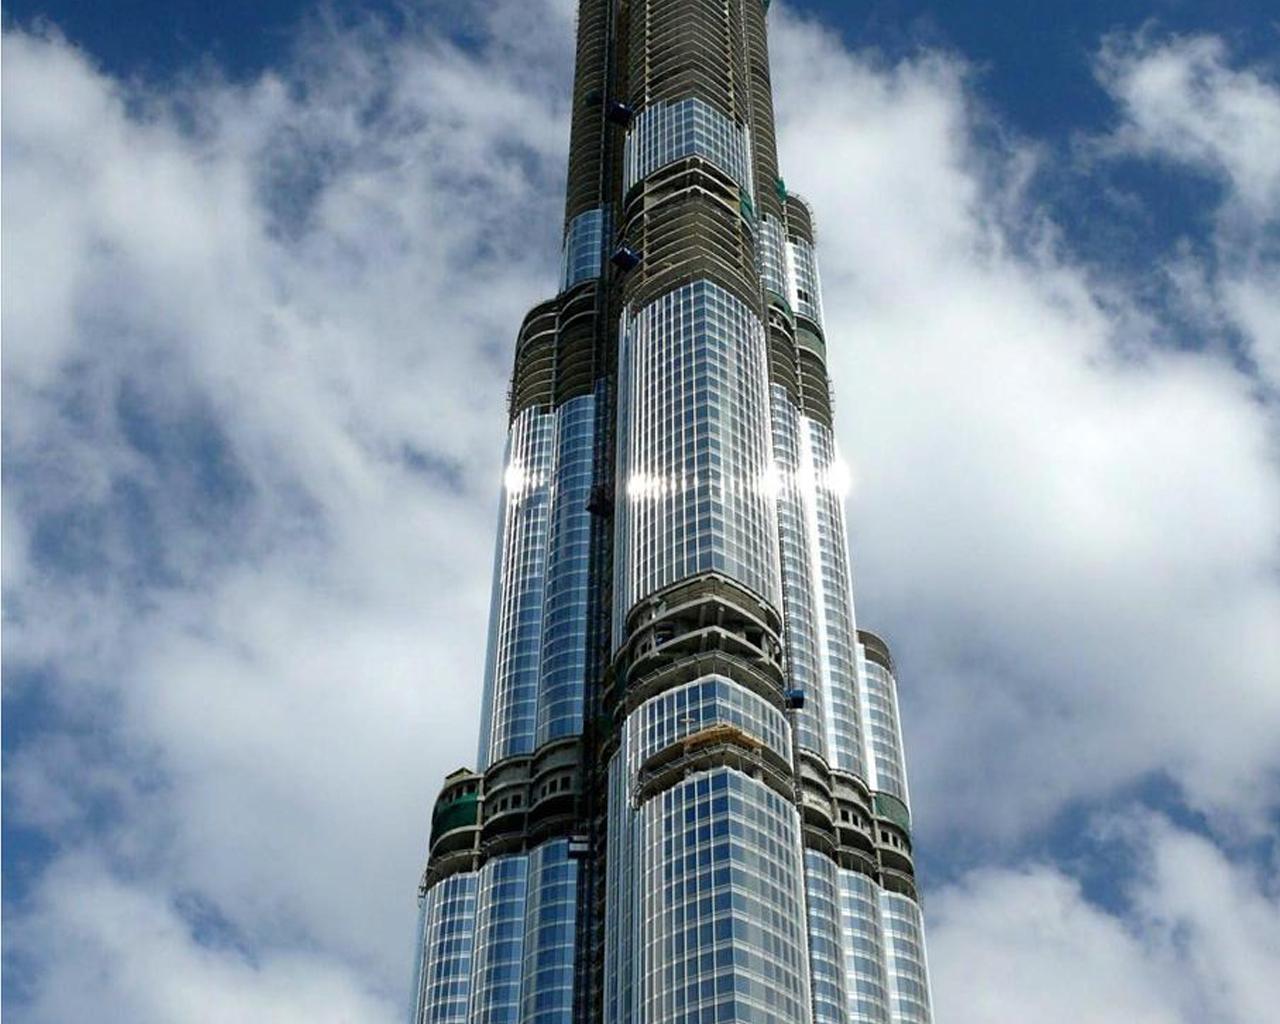 All wallpapers burj dubai wallpapers - Dubai burj khalifa hd wallpaper ...